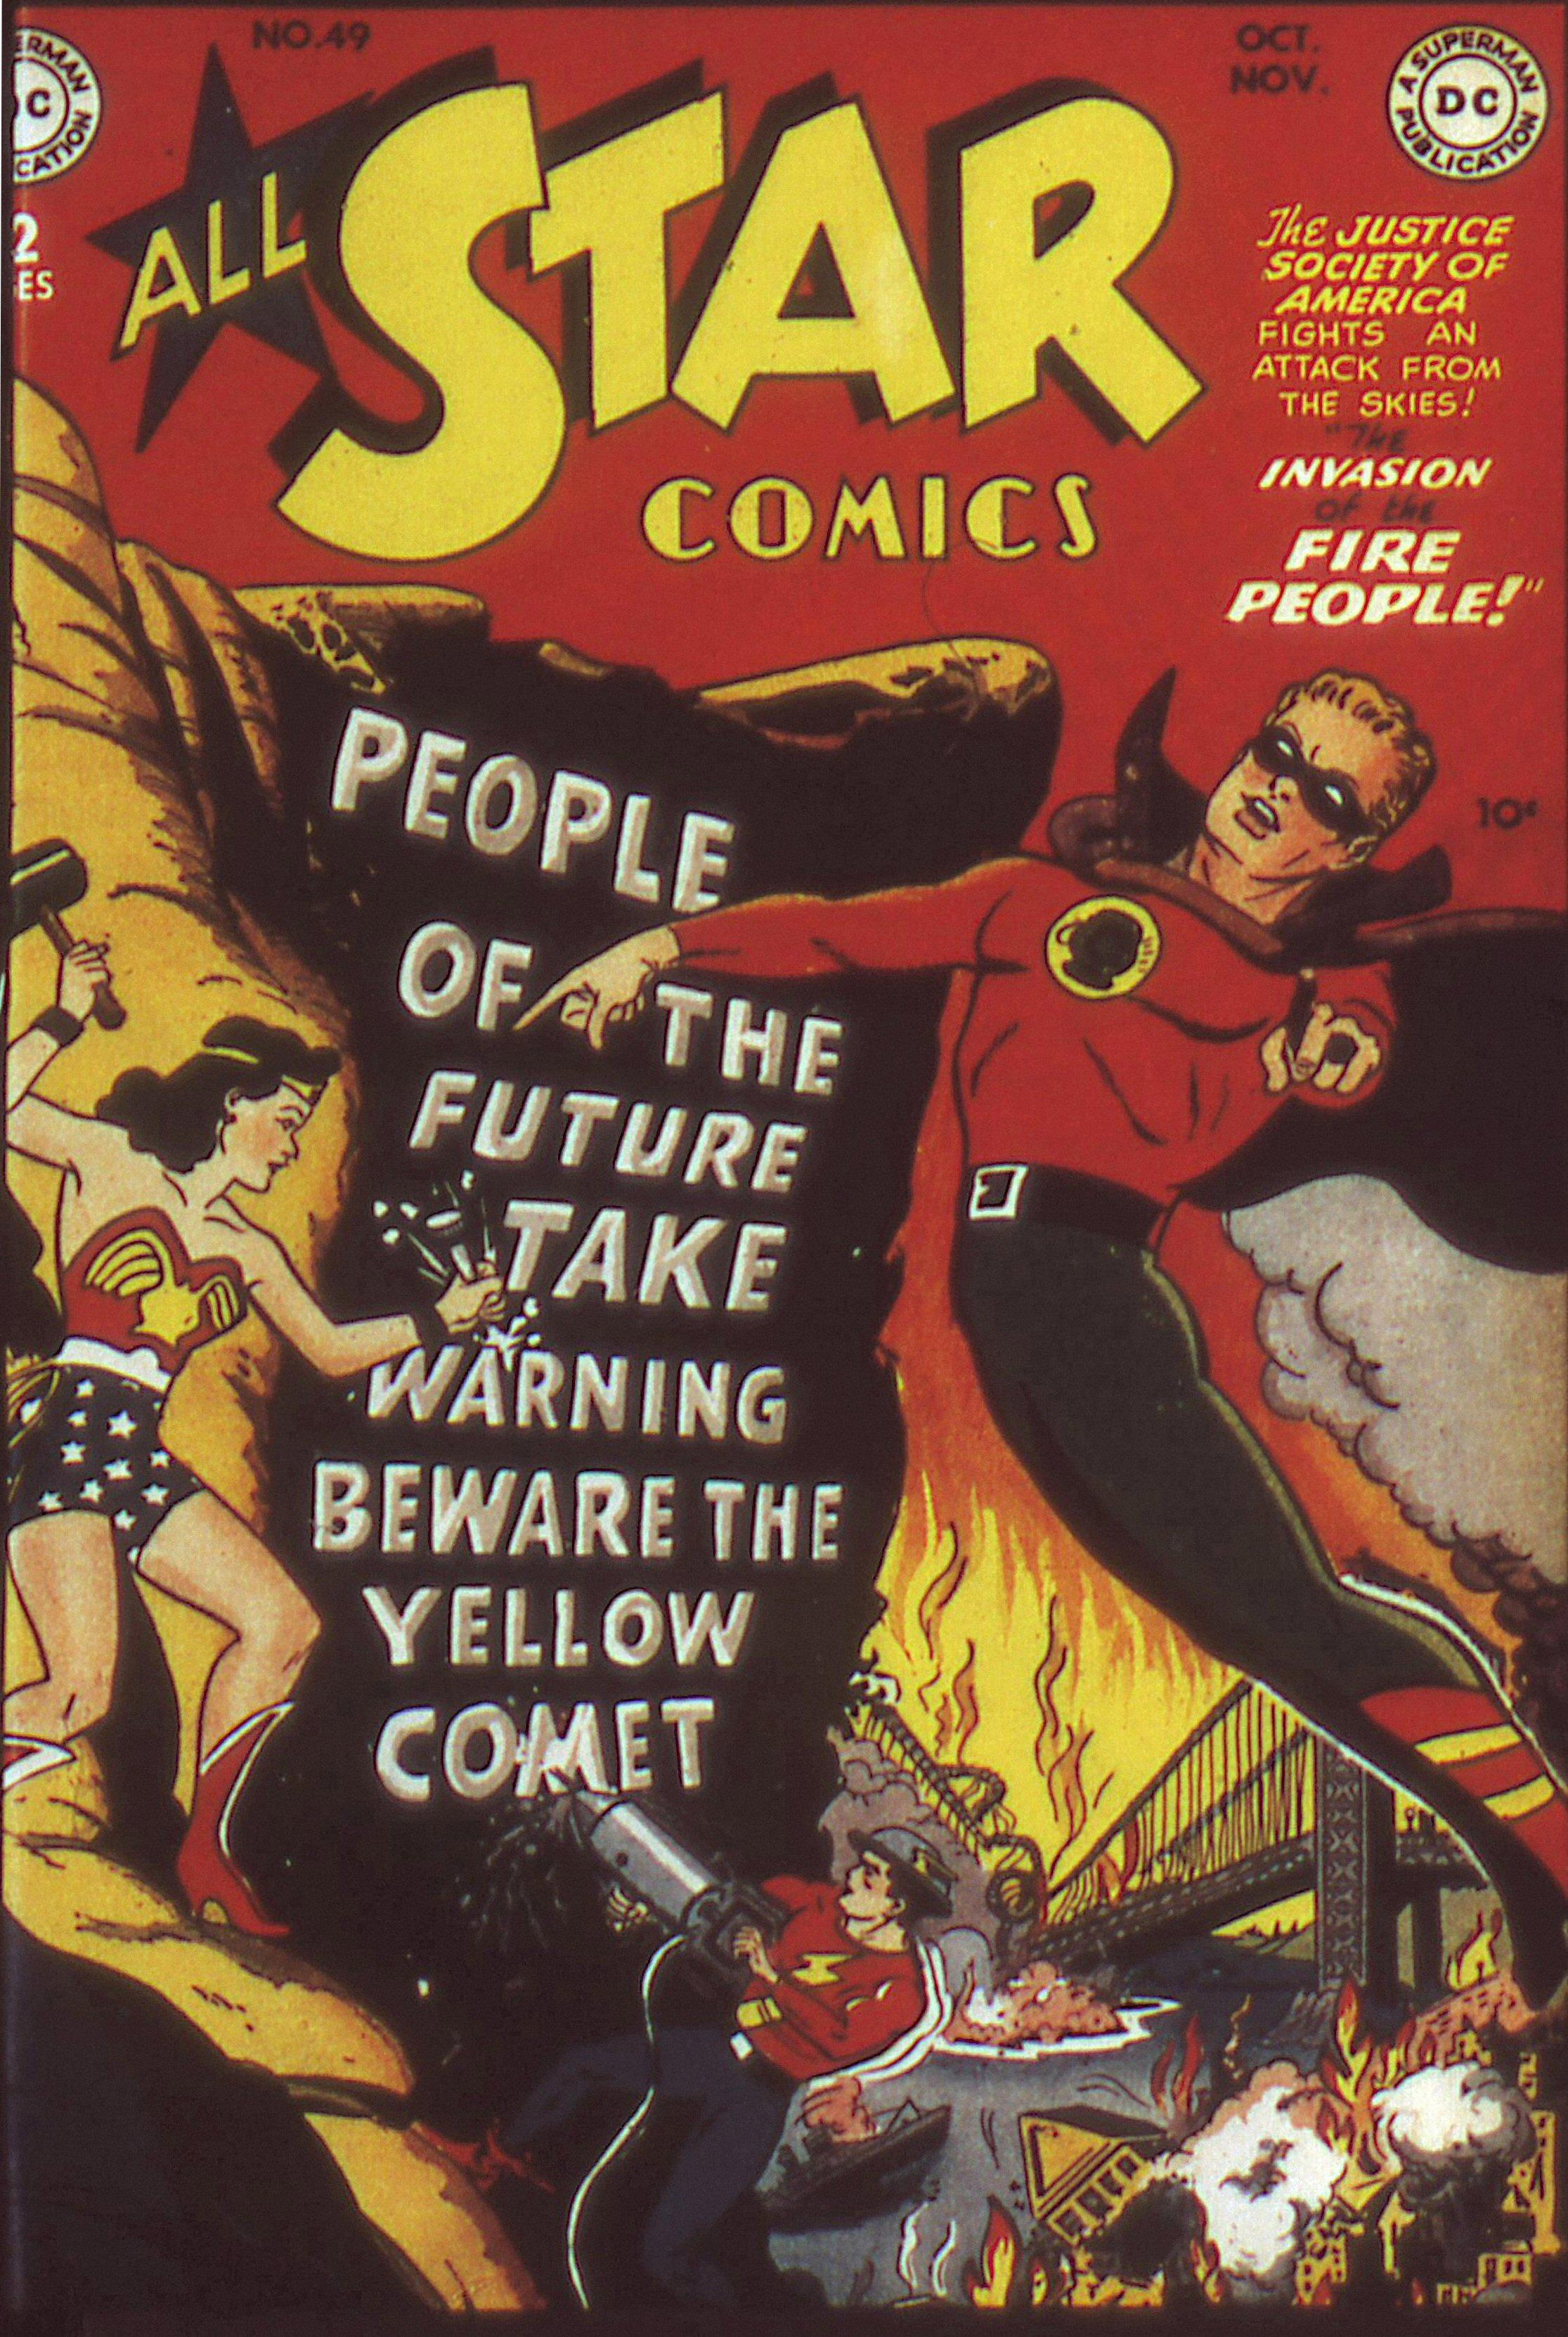 Read online All-Star Comics comic -  Issue #49 - 2